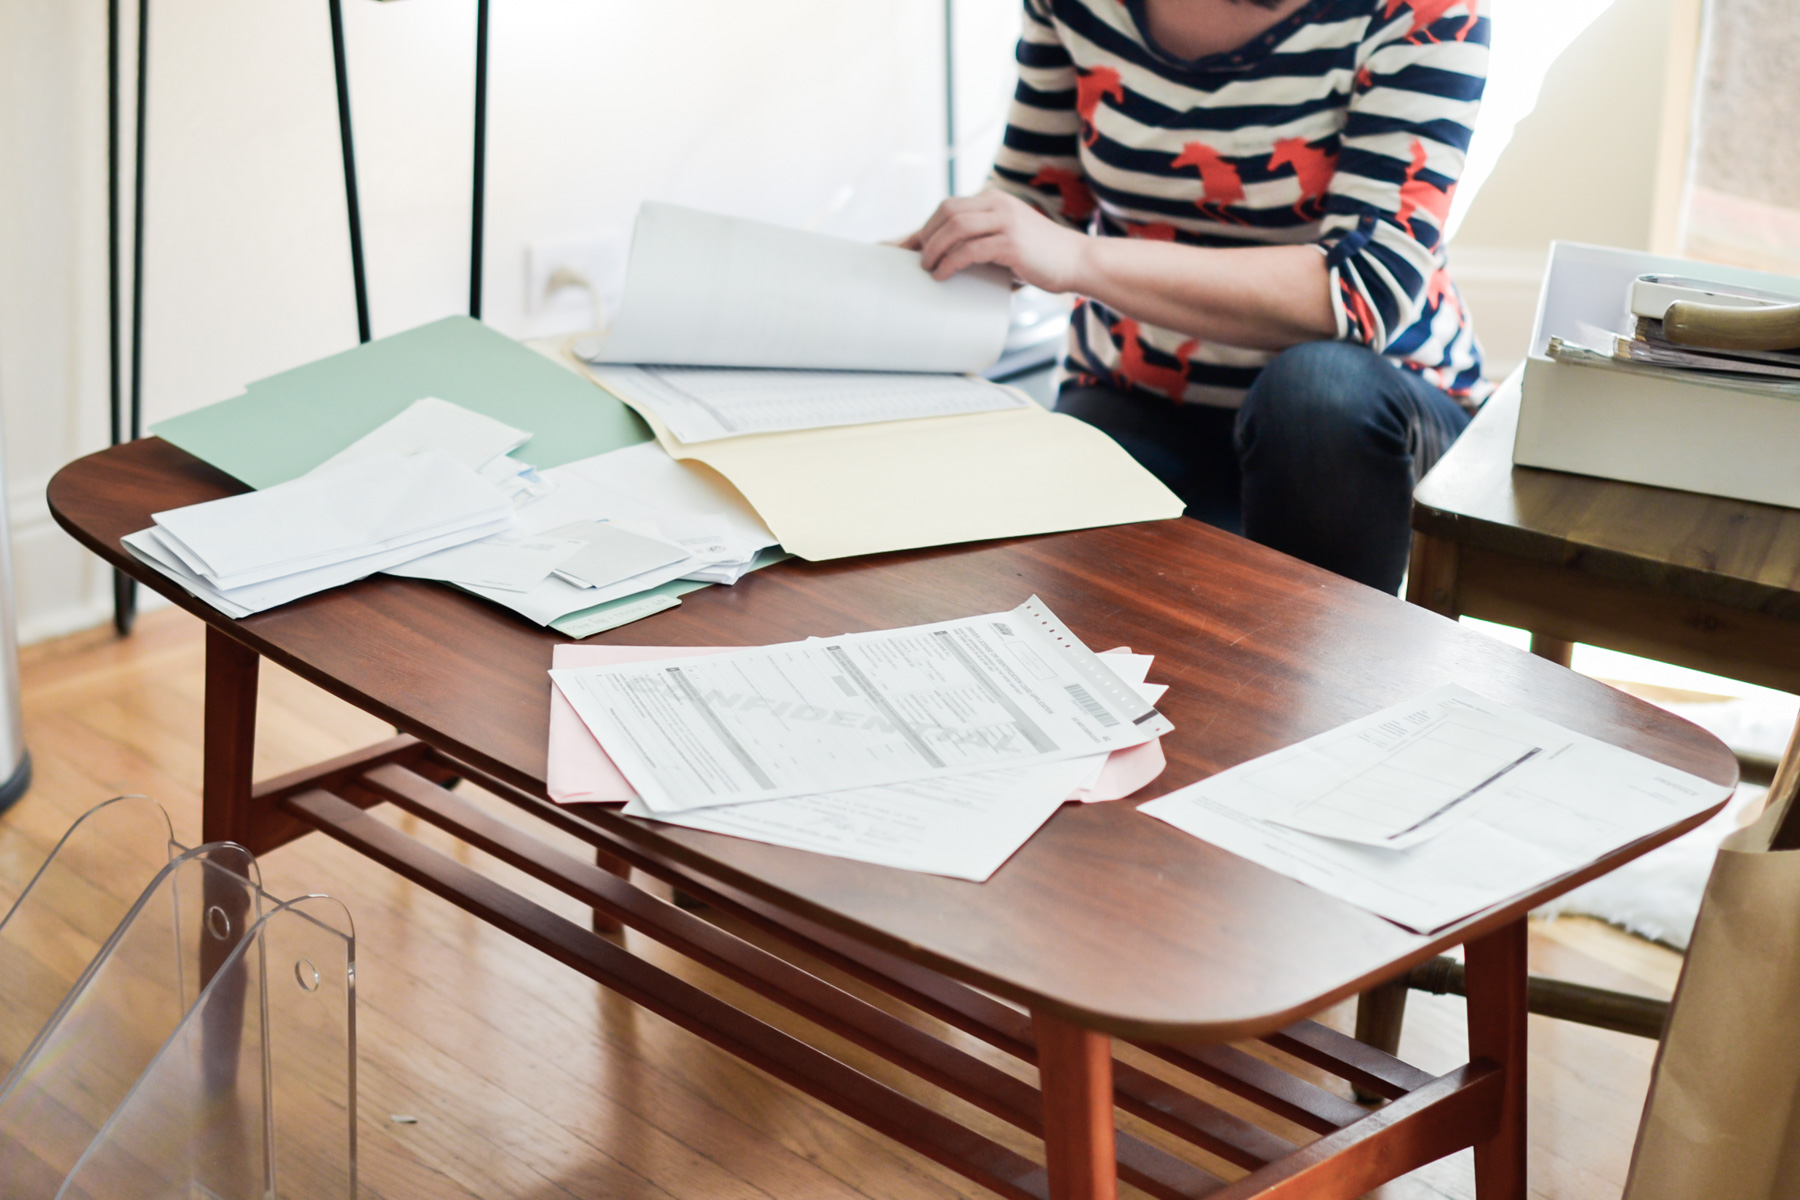 organizing files & paperwork with TaskRabbit